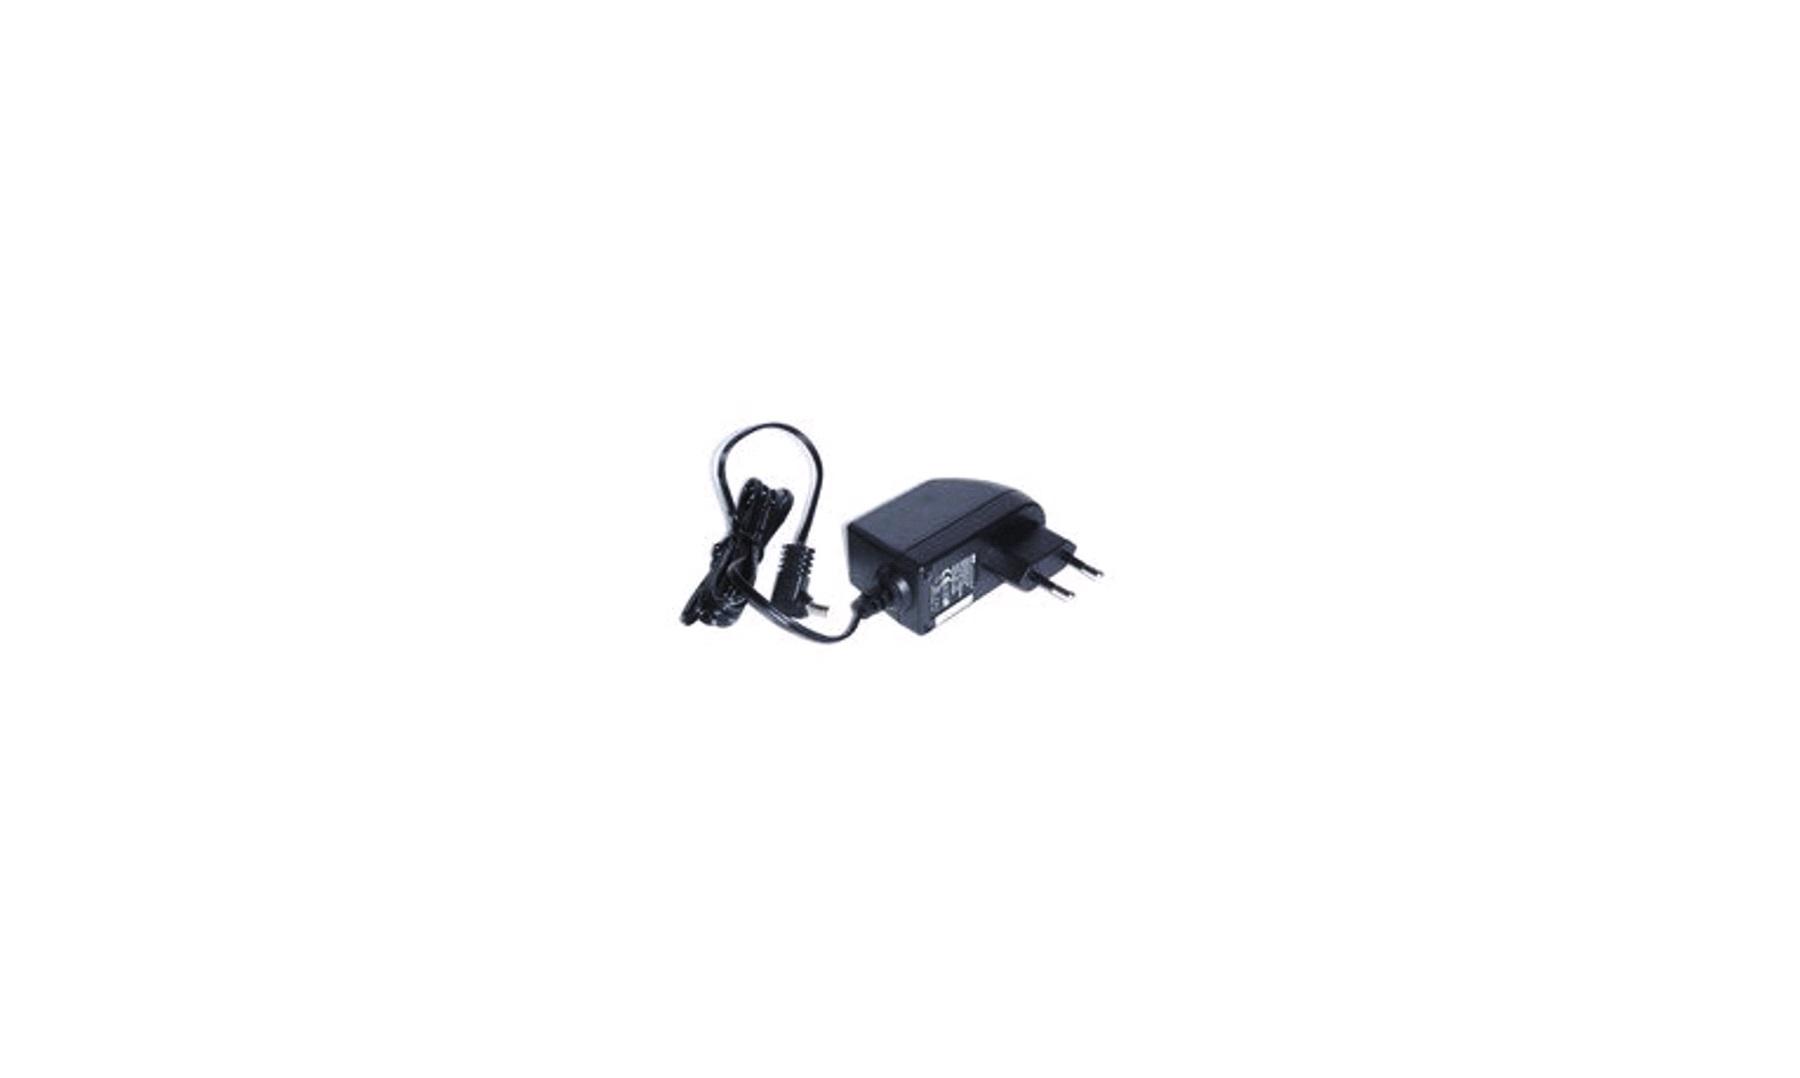 Strømadapter 220V til Notebook 15 20V Strømadapter 220V